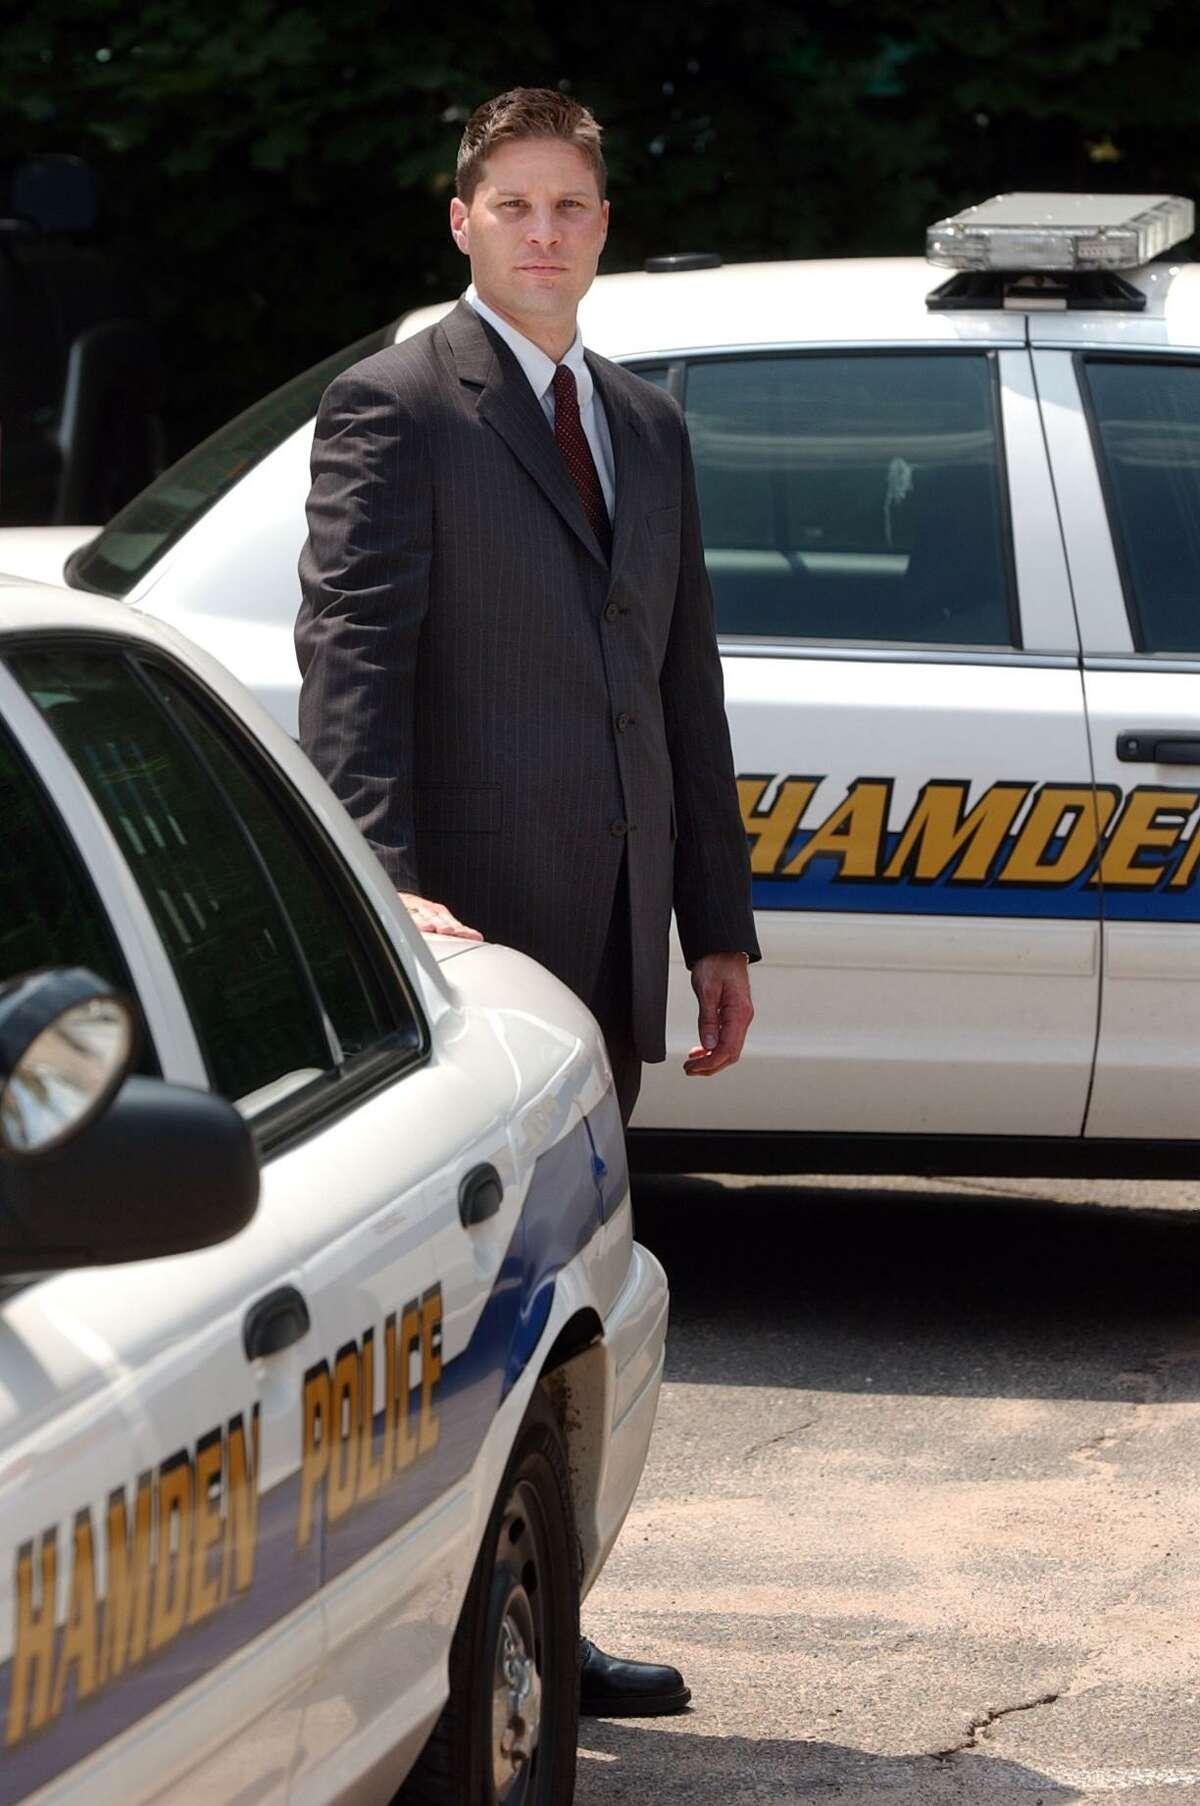 Thomas Wydra, Hamden Police Chief designate. Photo by Mara Lavitt